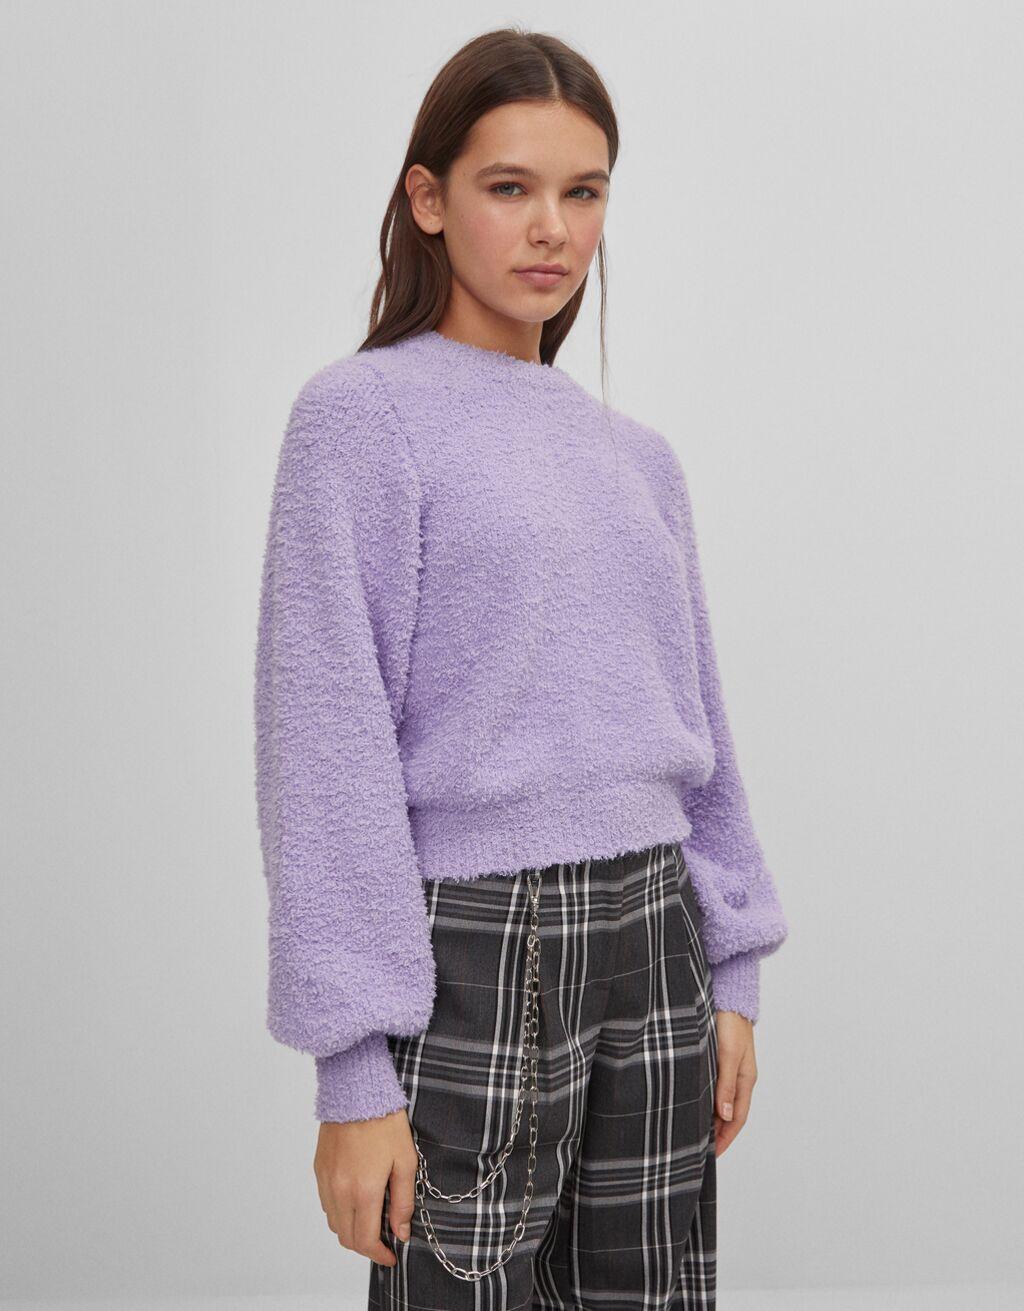 Hair effect sweater